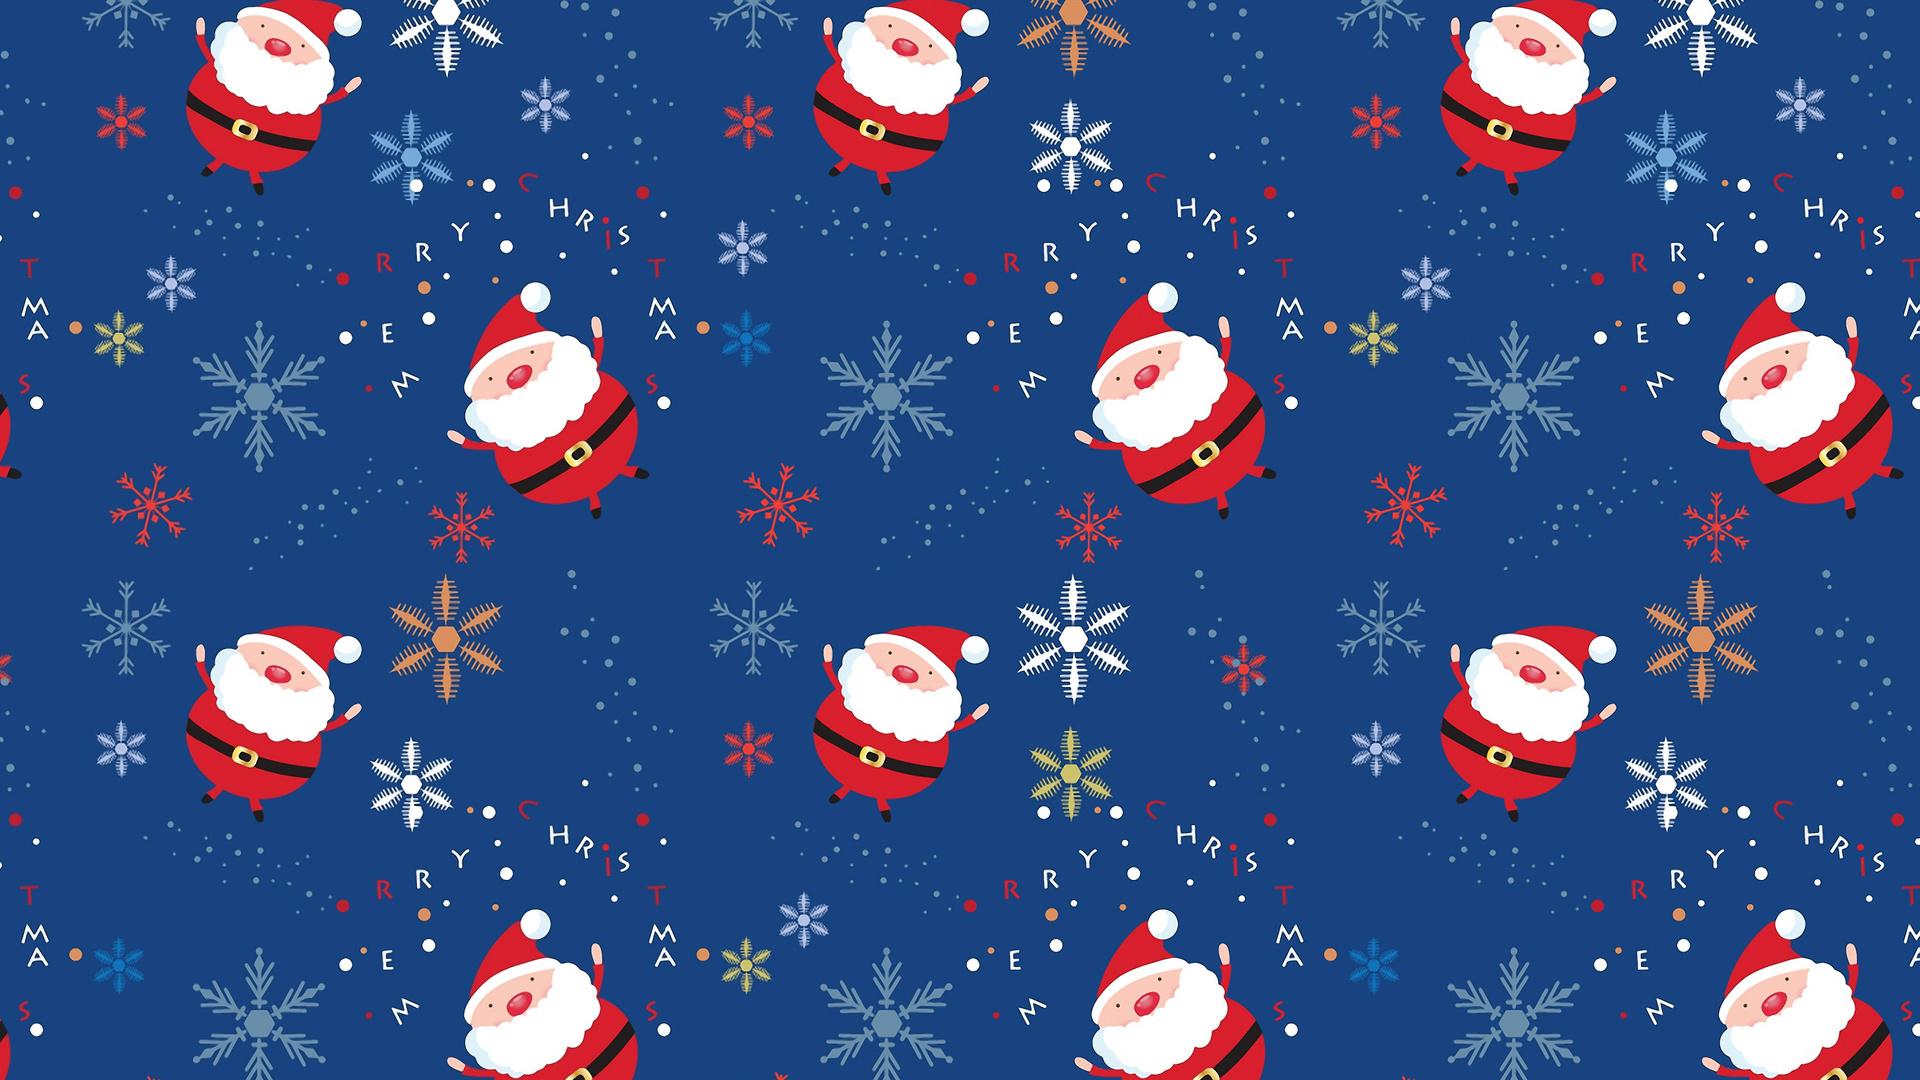 Cute Christmas Backgrounds Download Free Pixelstalknet